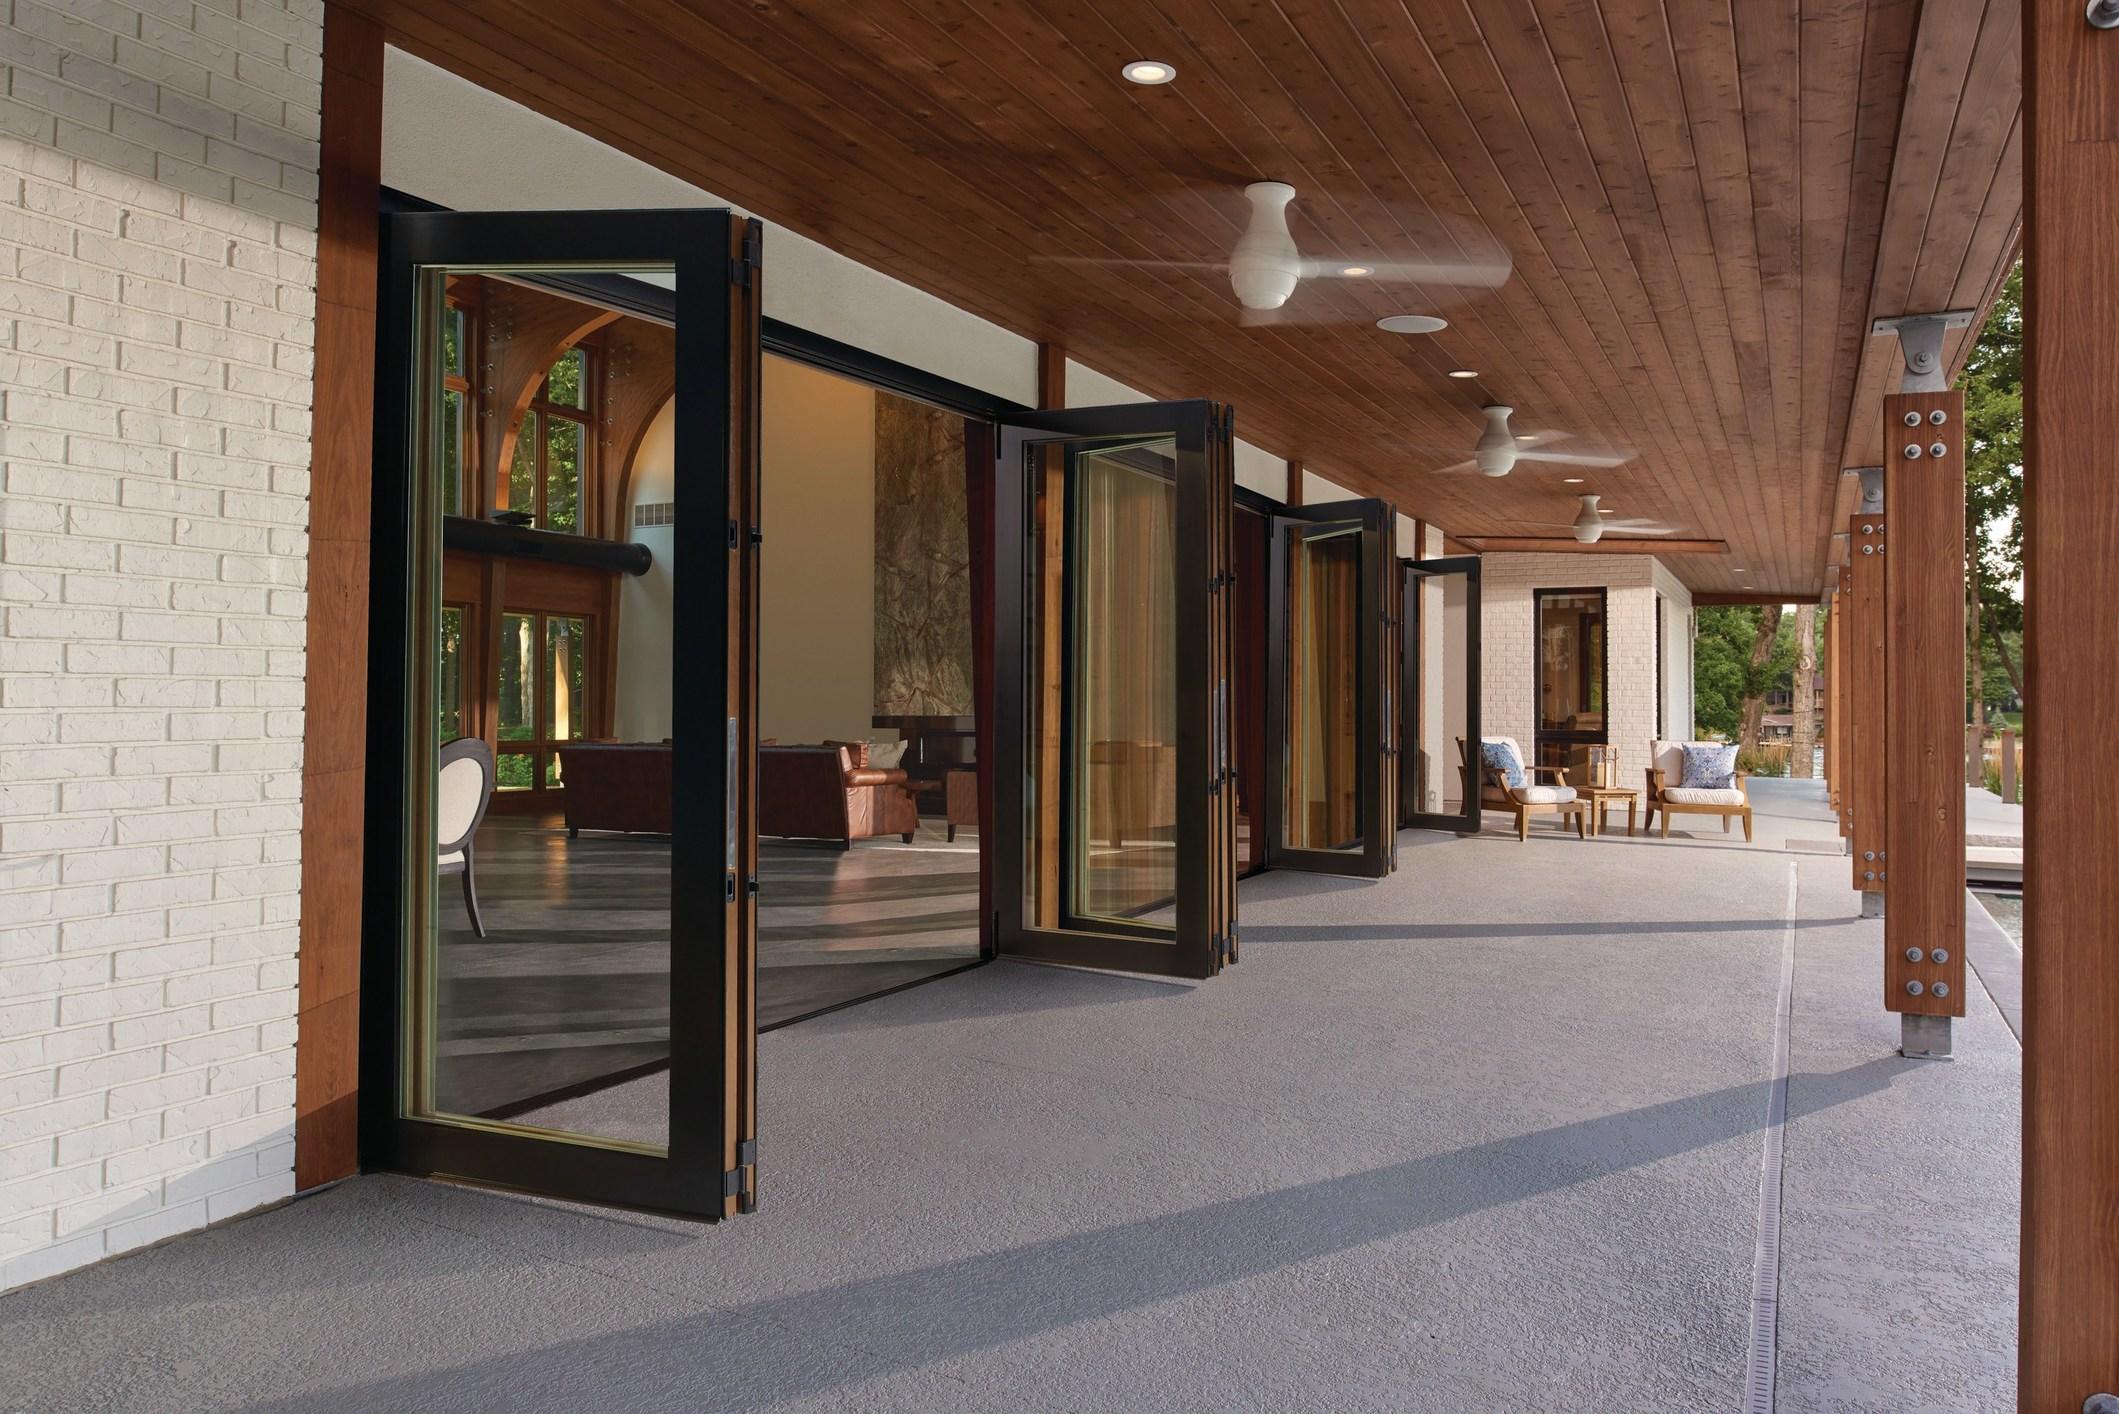 Marvin to showcase new bi fold door at ibs featuring one of marvin to showcase new bi fold door at ibs featuring one of industrys largest glass panels rubansaba